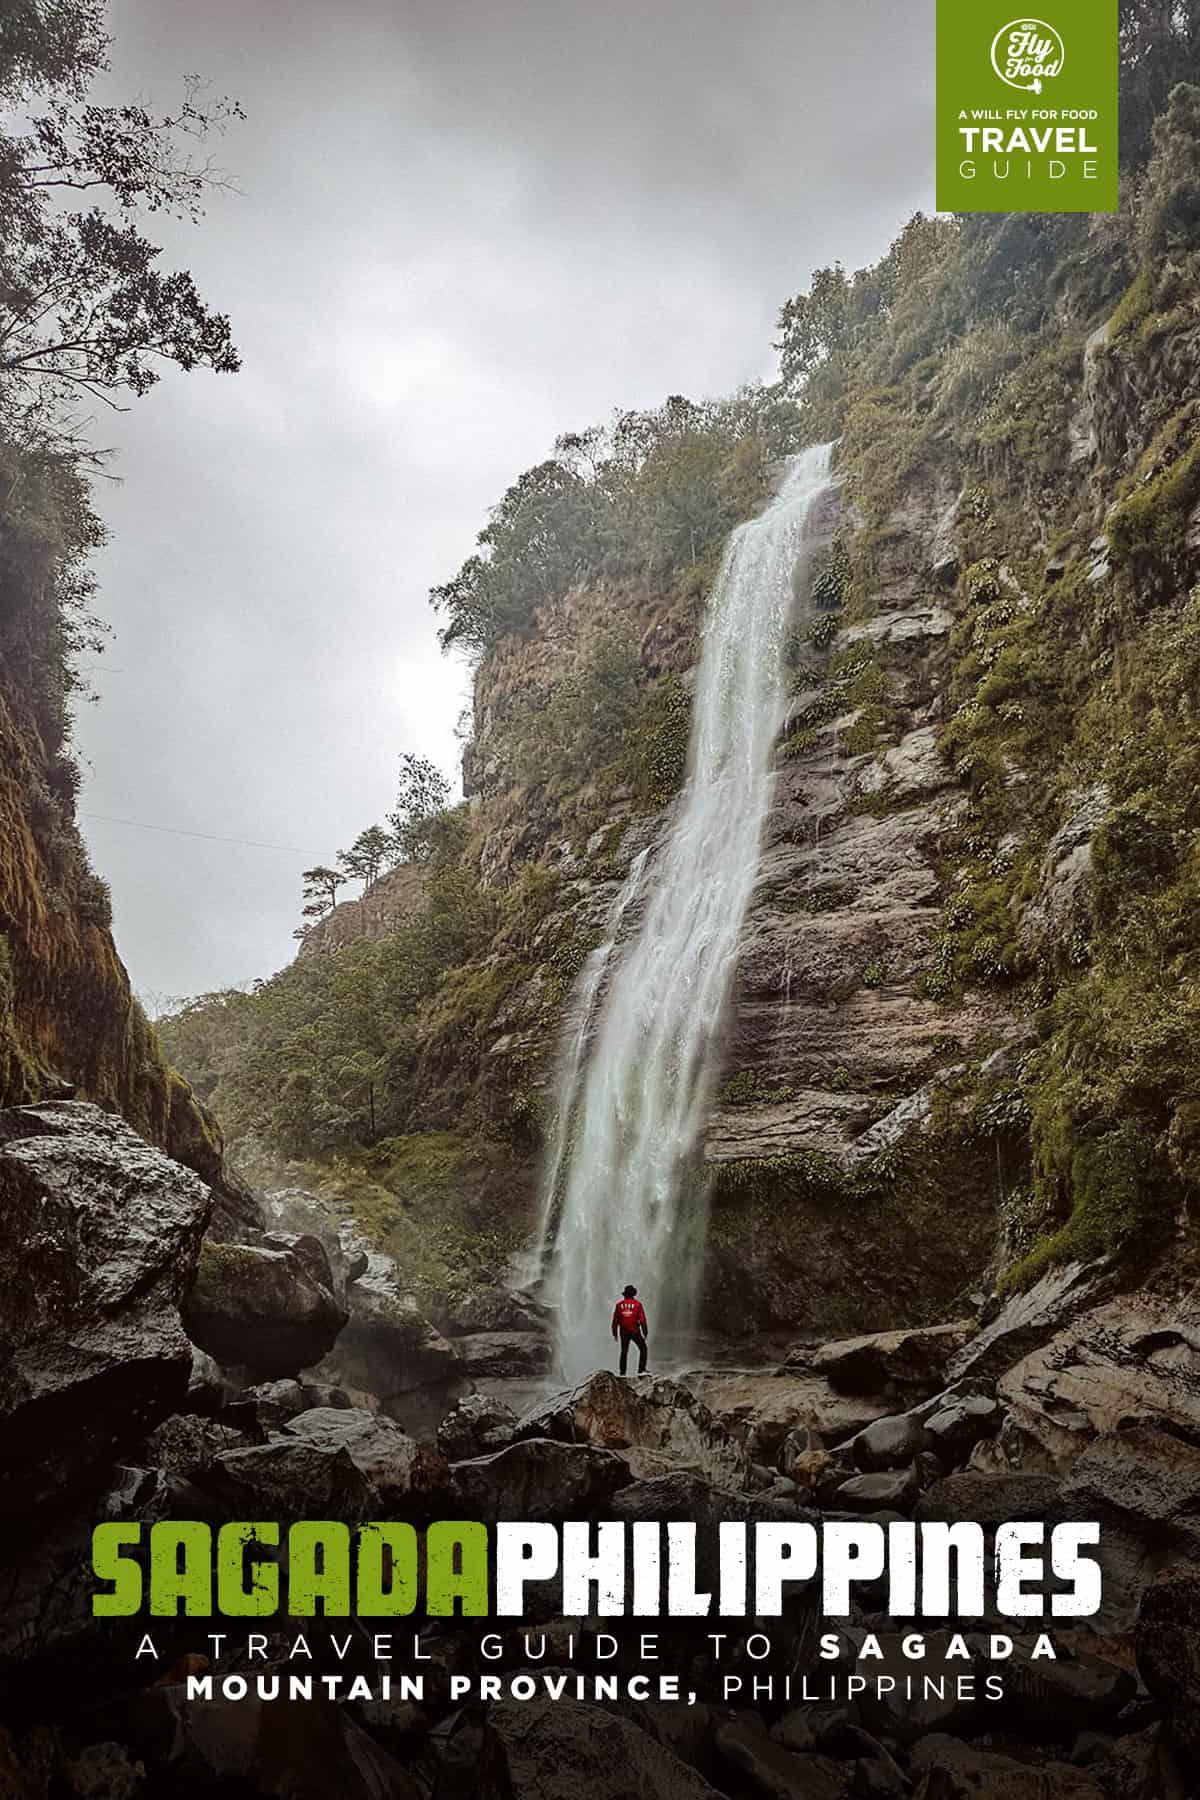 Bomod-ok Falls, Sagada, Mountain Province, Philippines